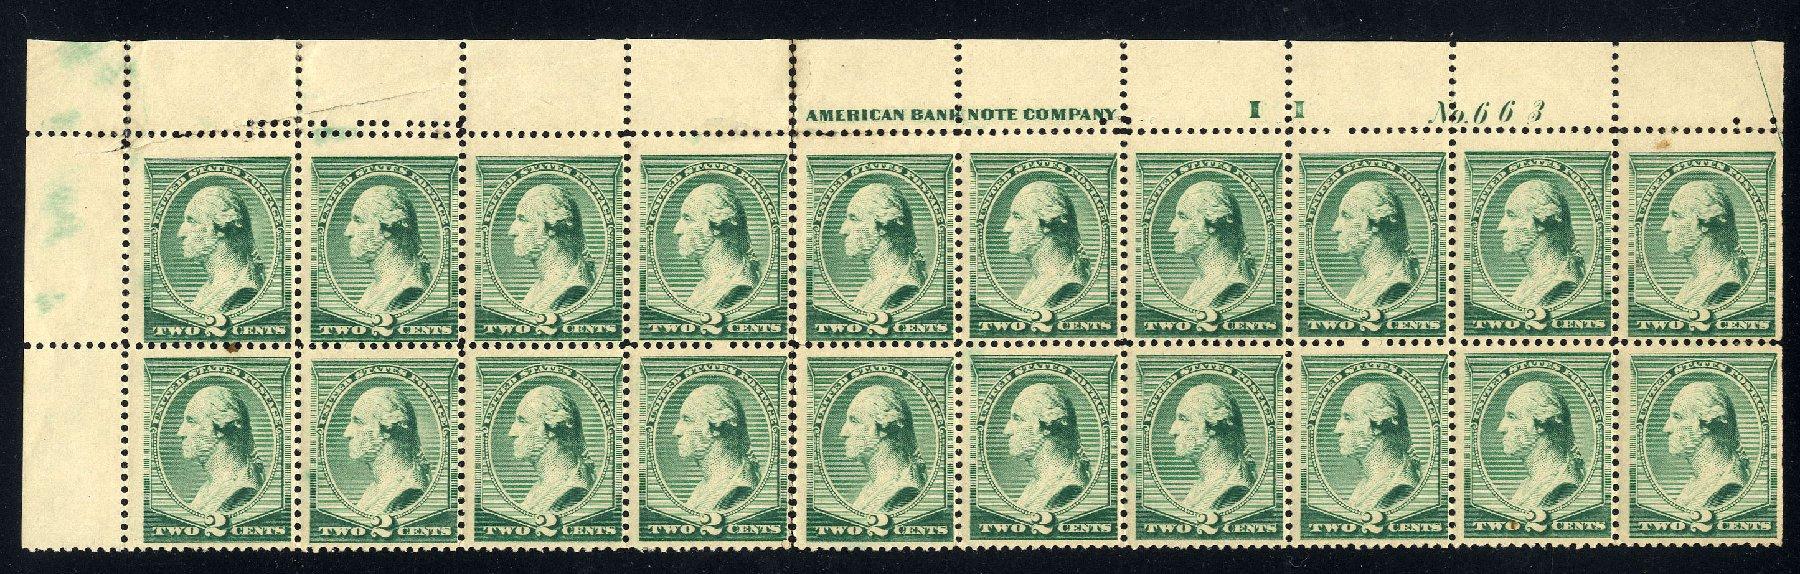 Price of US Stamps Scott 213 - 1883 2c Washington. Cherrystone Auctions, Nov 2013, Sale 201311, Lot 35